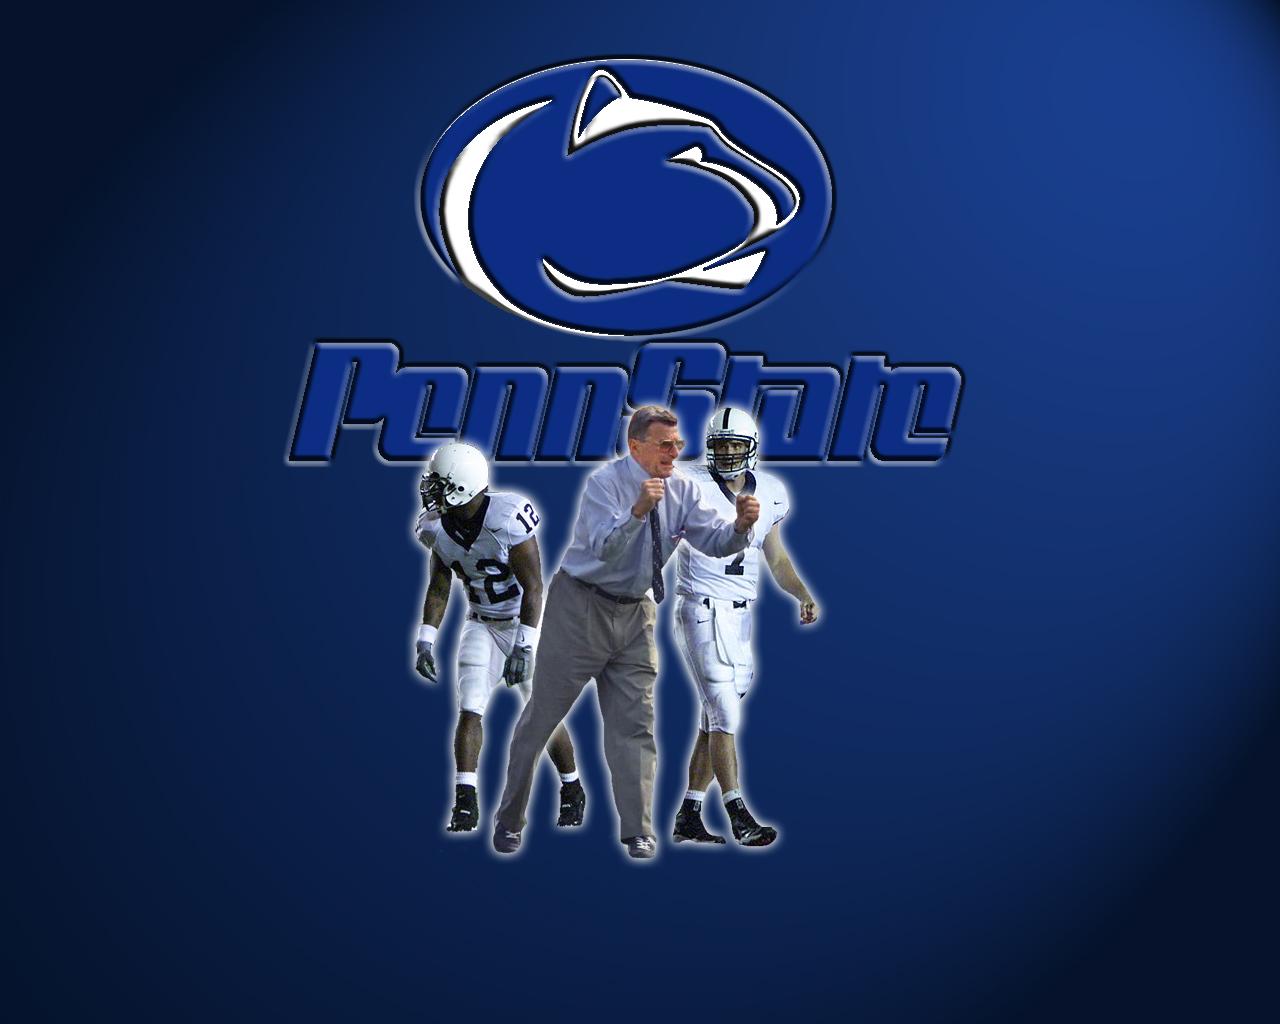 25 ship a Penn State University Football Camp penn ncaa 1280x1024